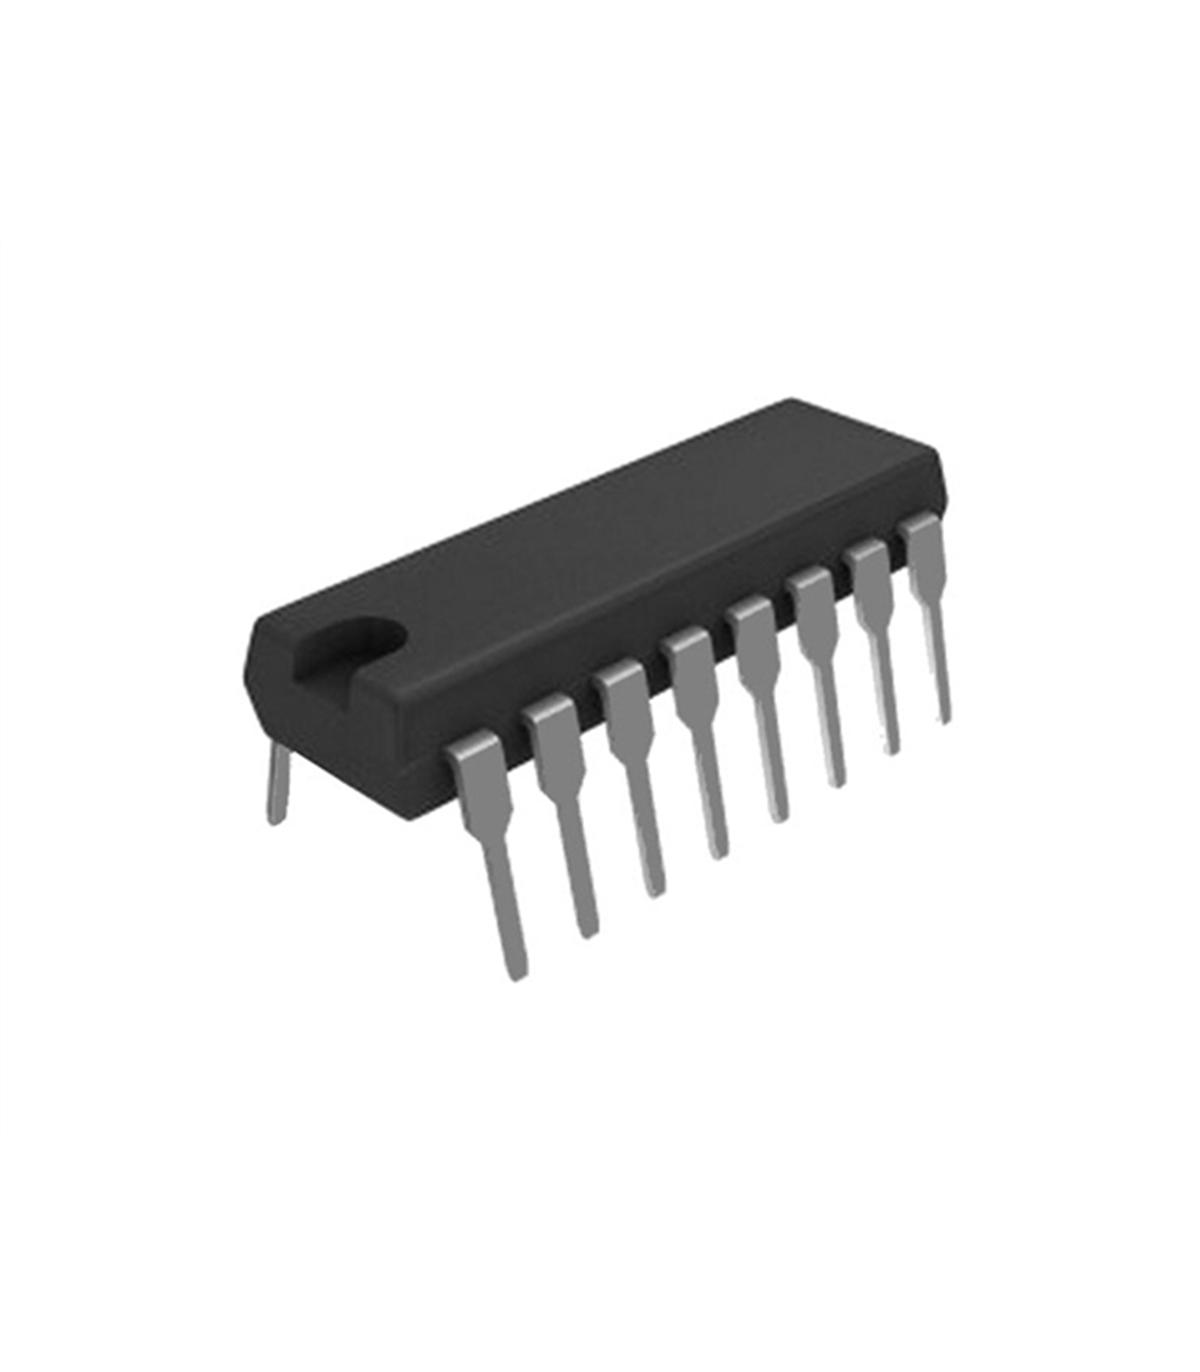 4.75 V to 5.25 V SN74LS163AN 32 MHz DIP-16